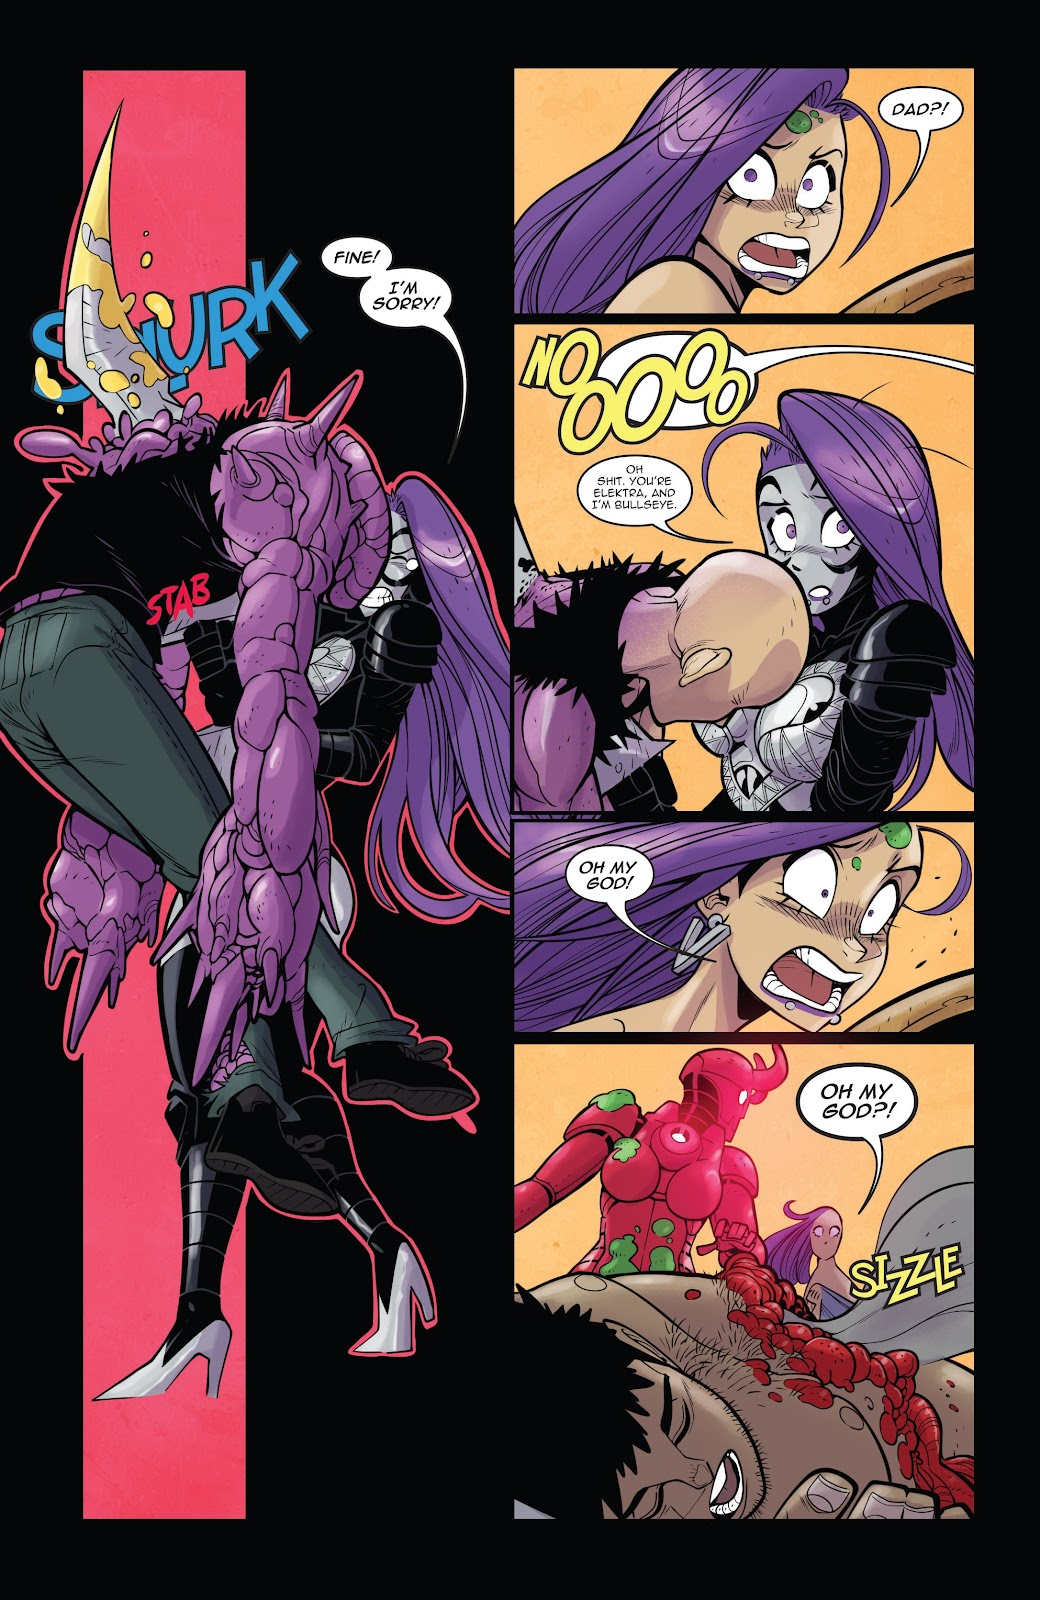 Read online Vampblade Season 3 comic -  Issue #11 - 23